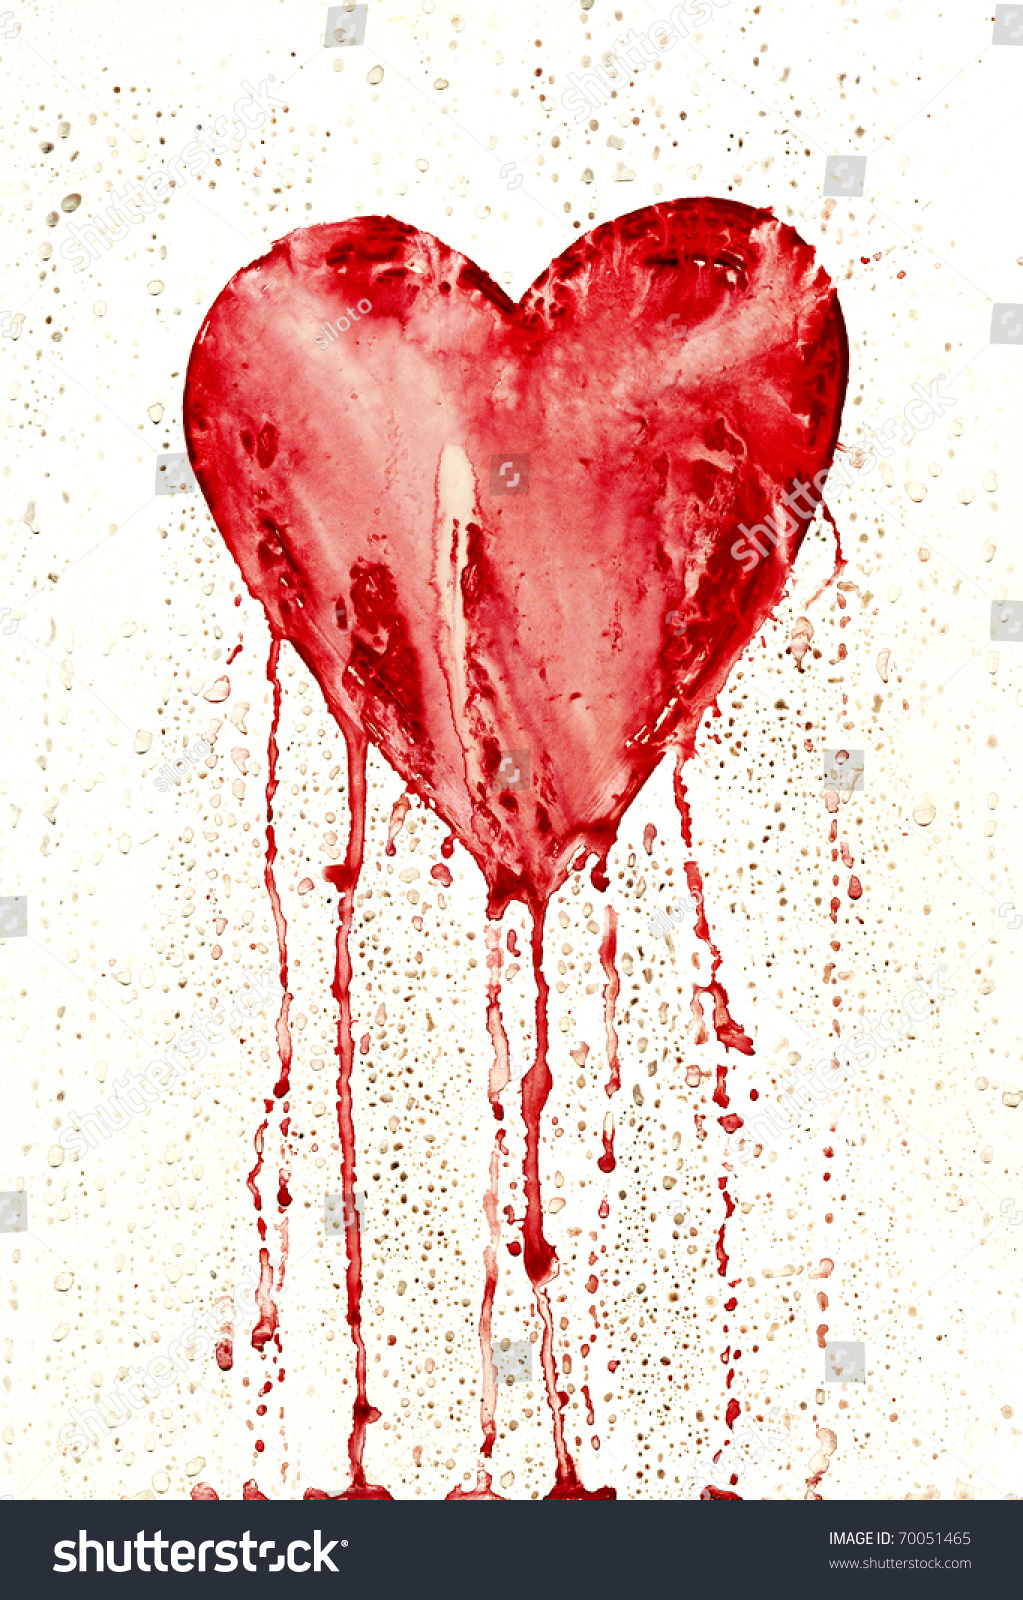 Bleeding heart symbol love stock illustration 70051465 shutterstock bleeding heart symbol of love biocorpaavc Gallery